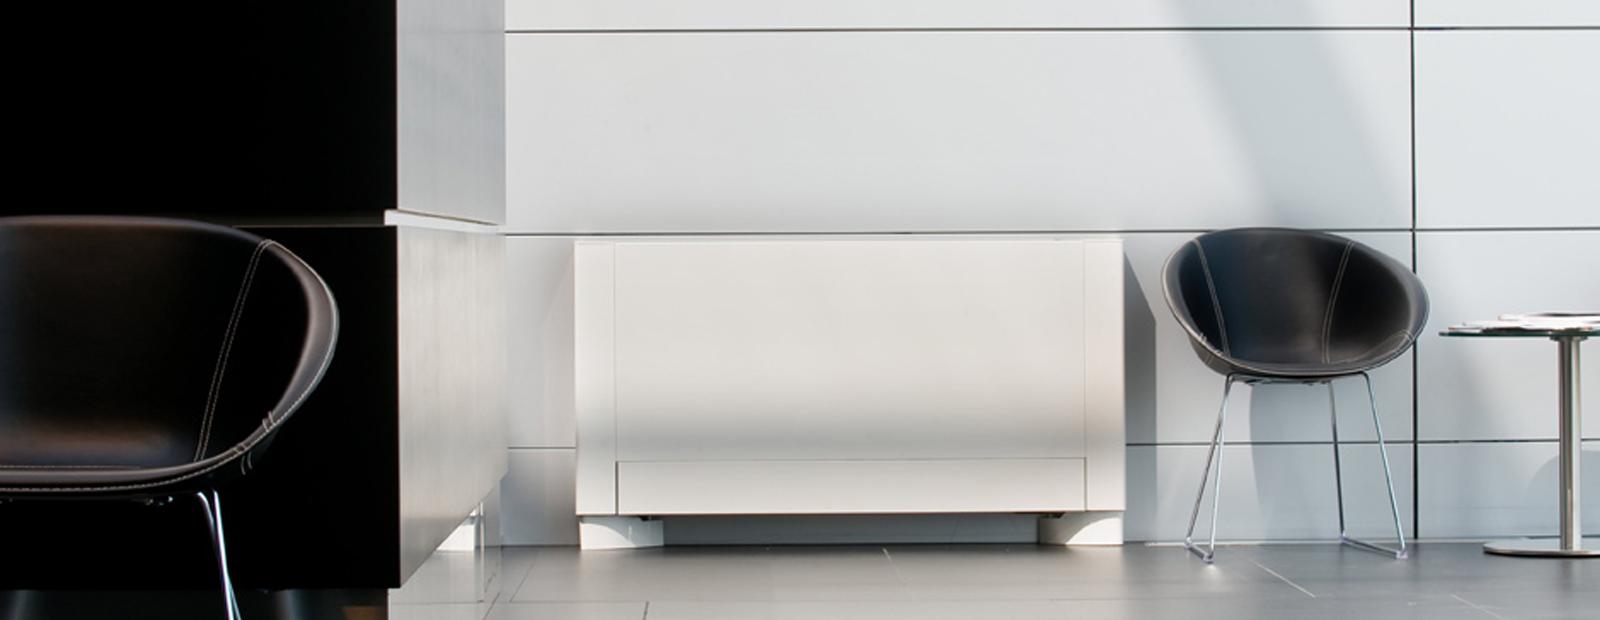 bi2 slr ventilo radiateur plaque rayonnante. Black Bedroom Furniture Sets. Home Design Ideas